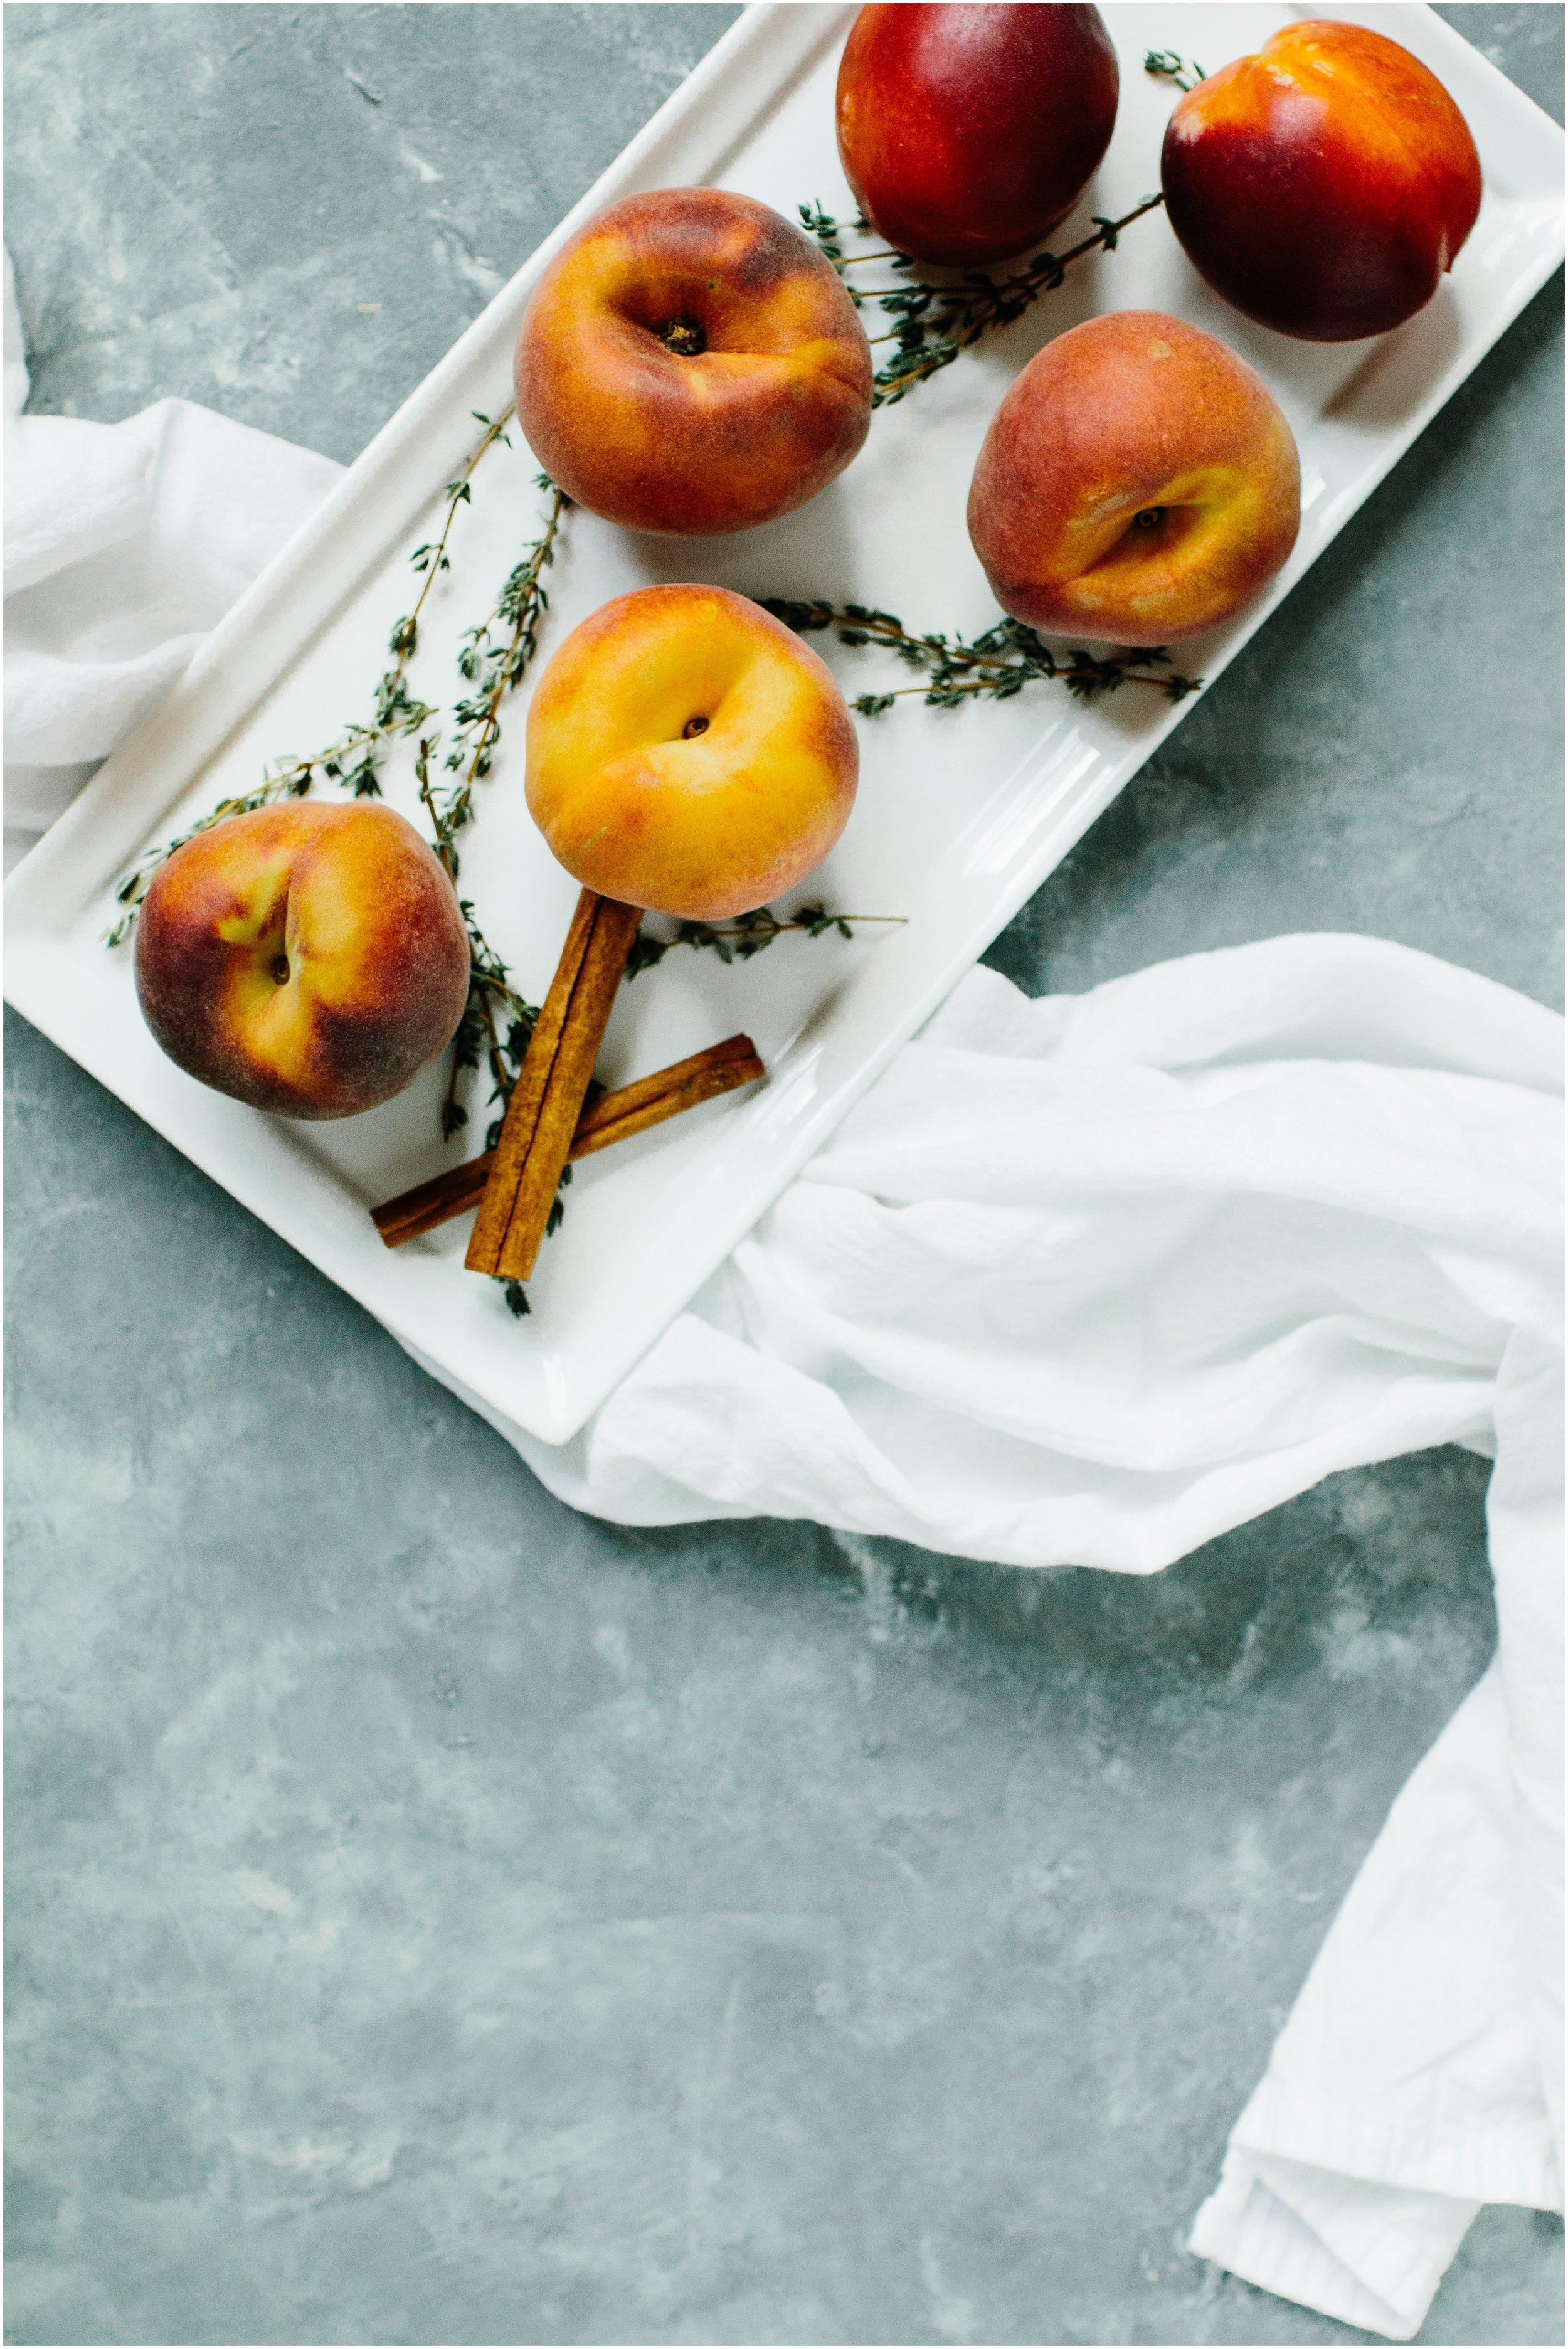 A&M_foodphotography_cookbook_0670.jpg